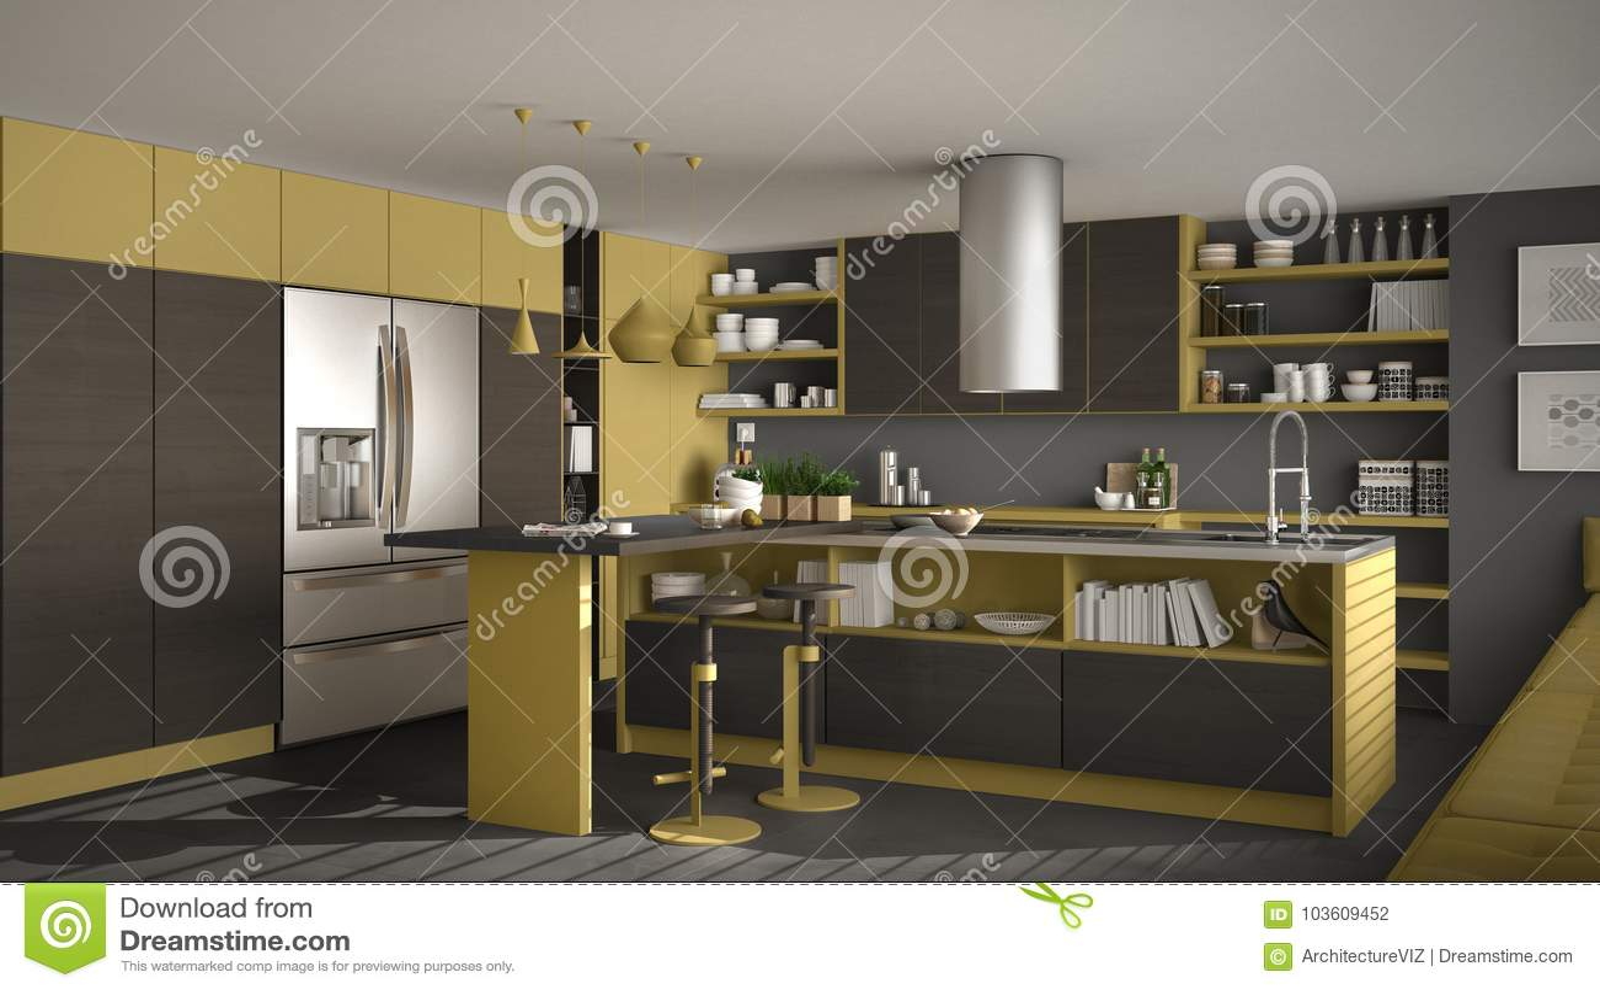 grey kitchen blinds restaurant doors 有木细节 灰色和黄色minim的现代木厨房库存例证 插画包括有灌肠器 灰色和黄色minim的现代木厨房